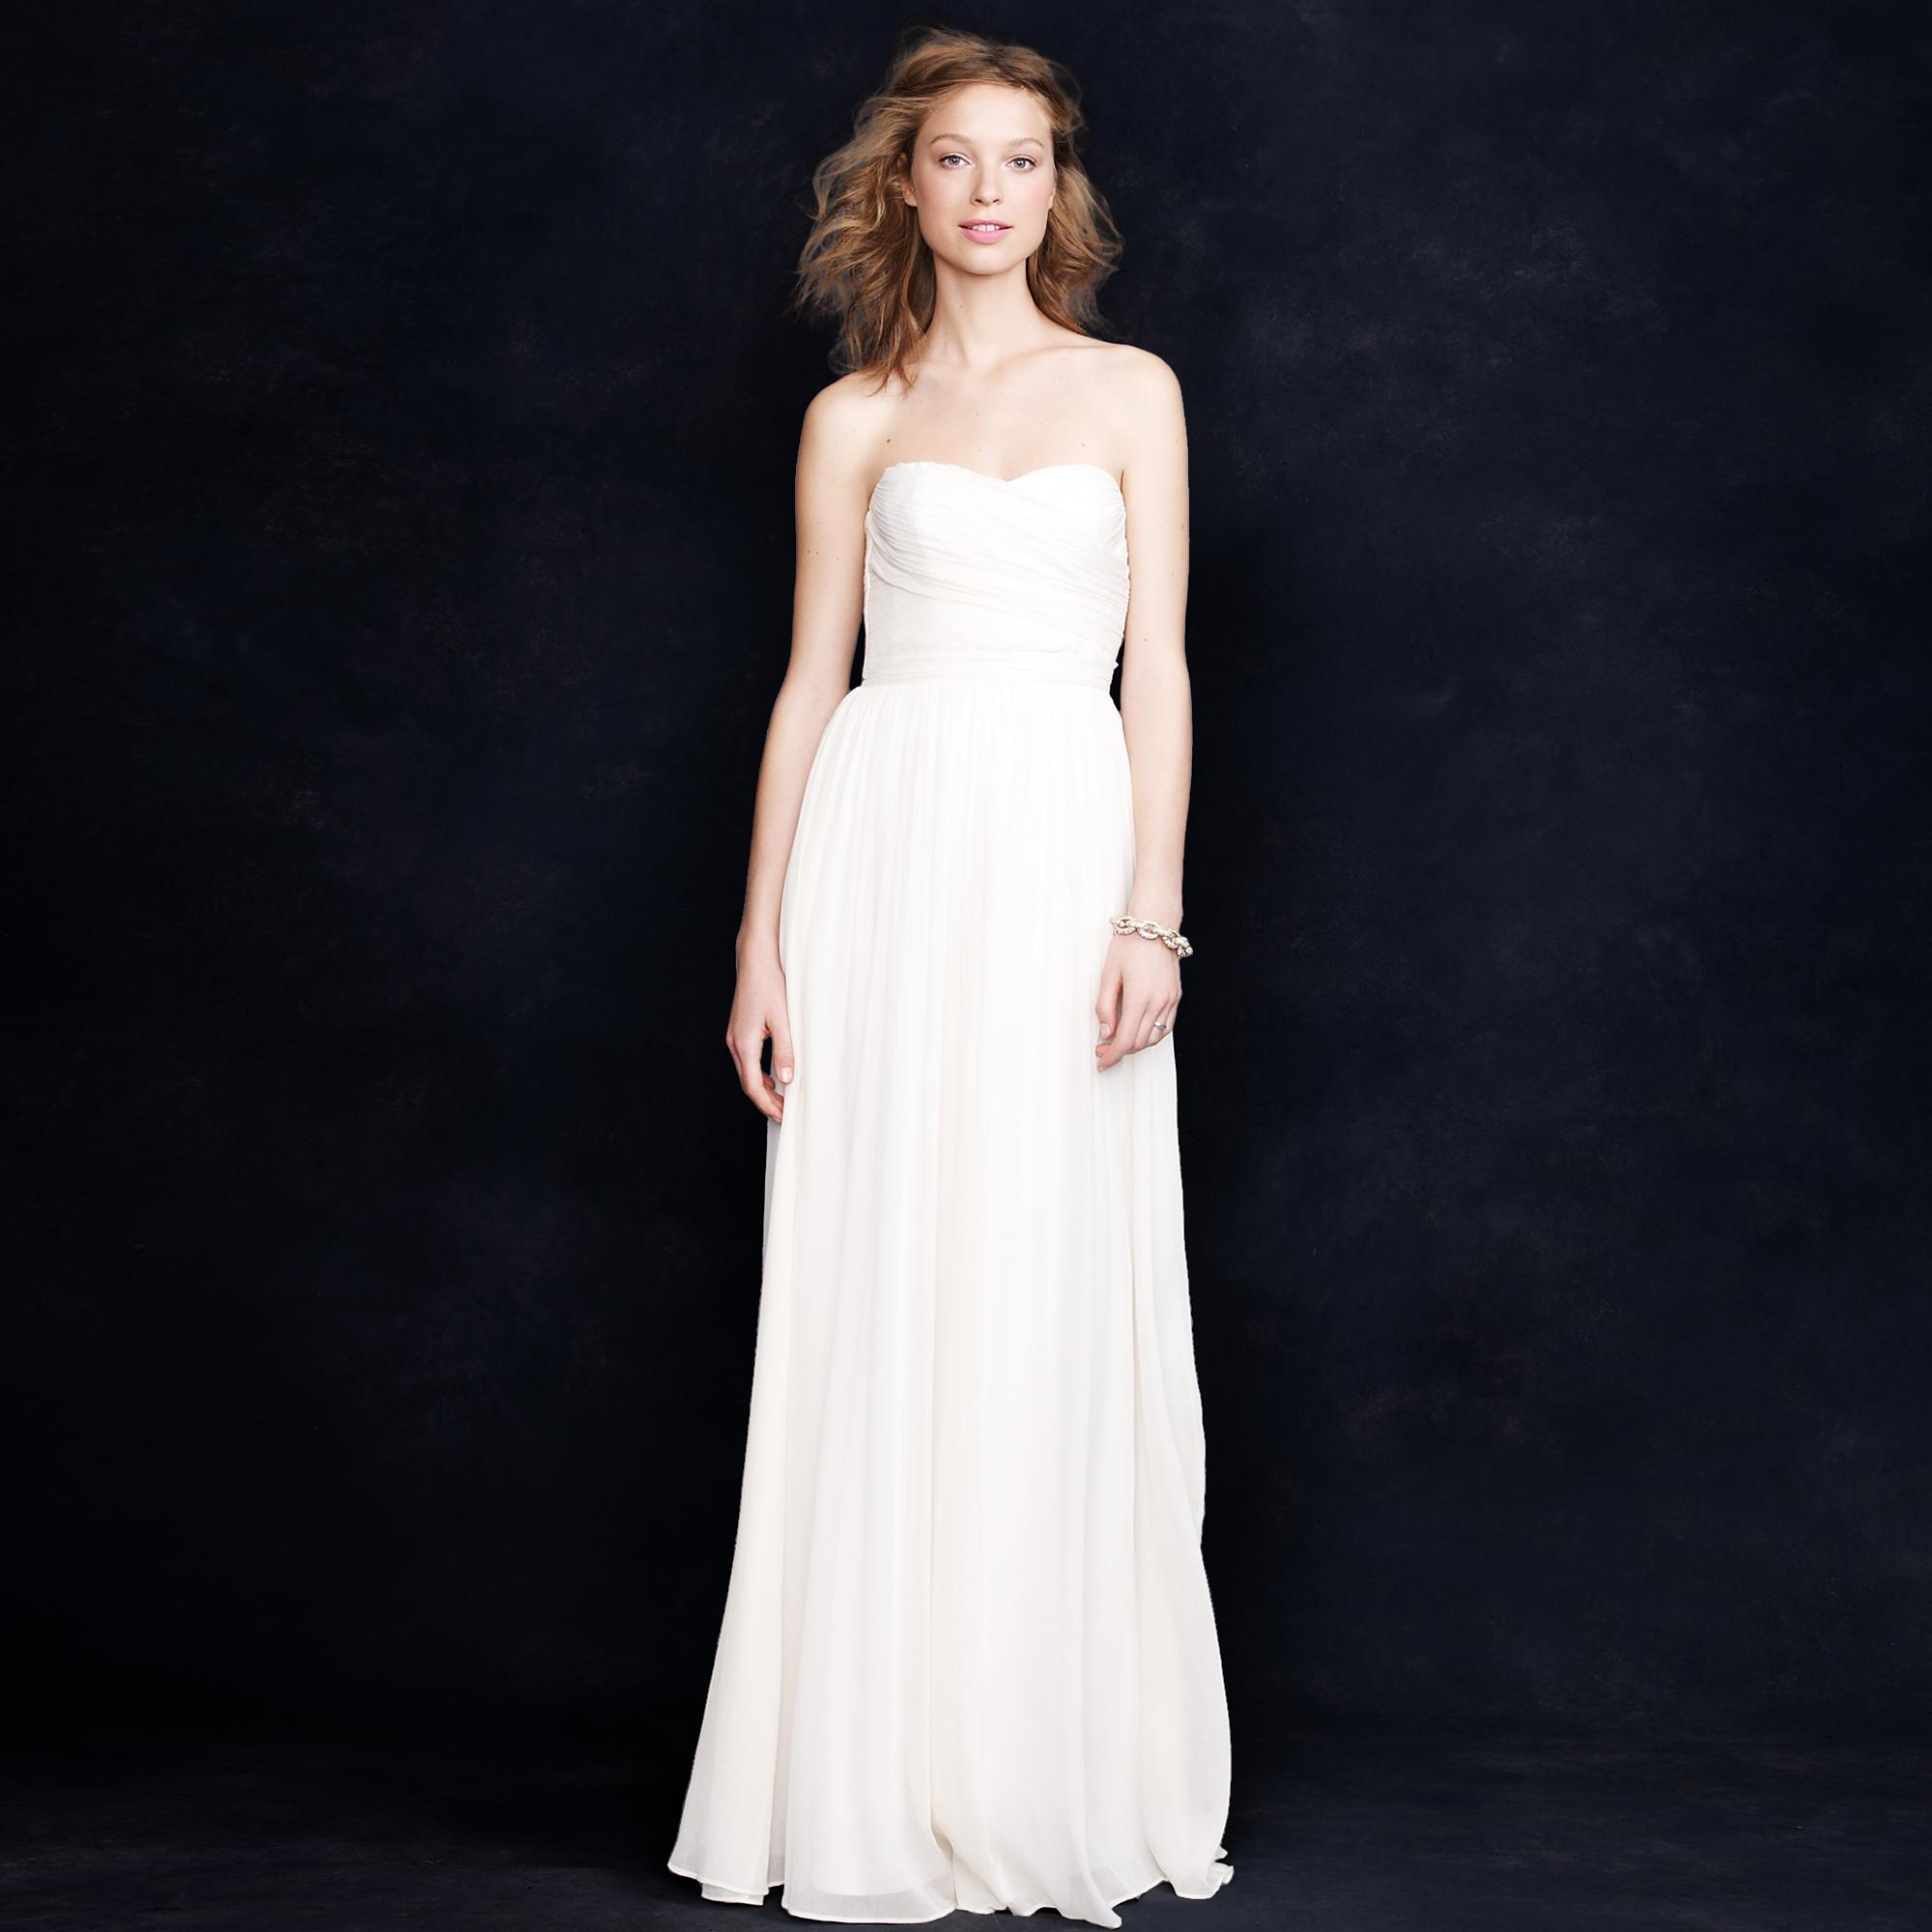 petite wedding dress Petite Arabelle gown Petite Arabelle gown Petite Arabelle gown